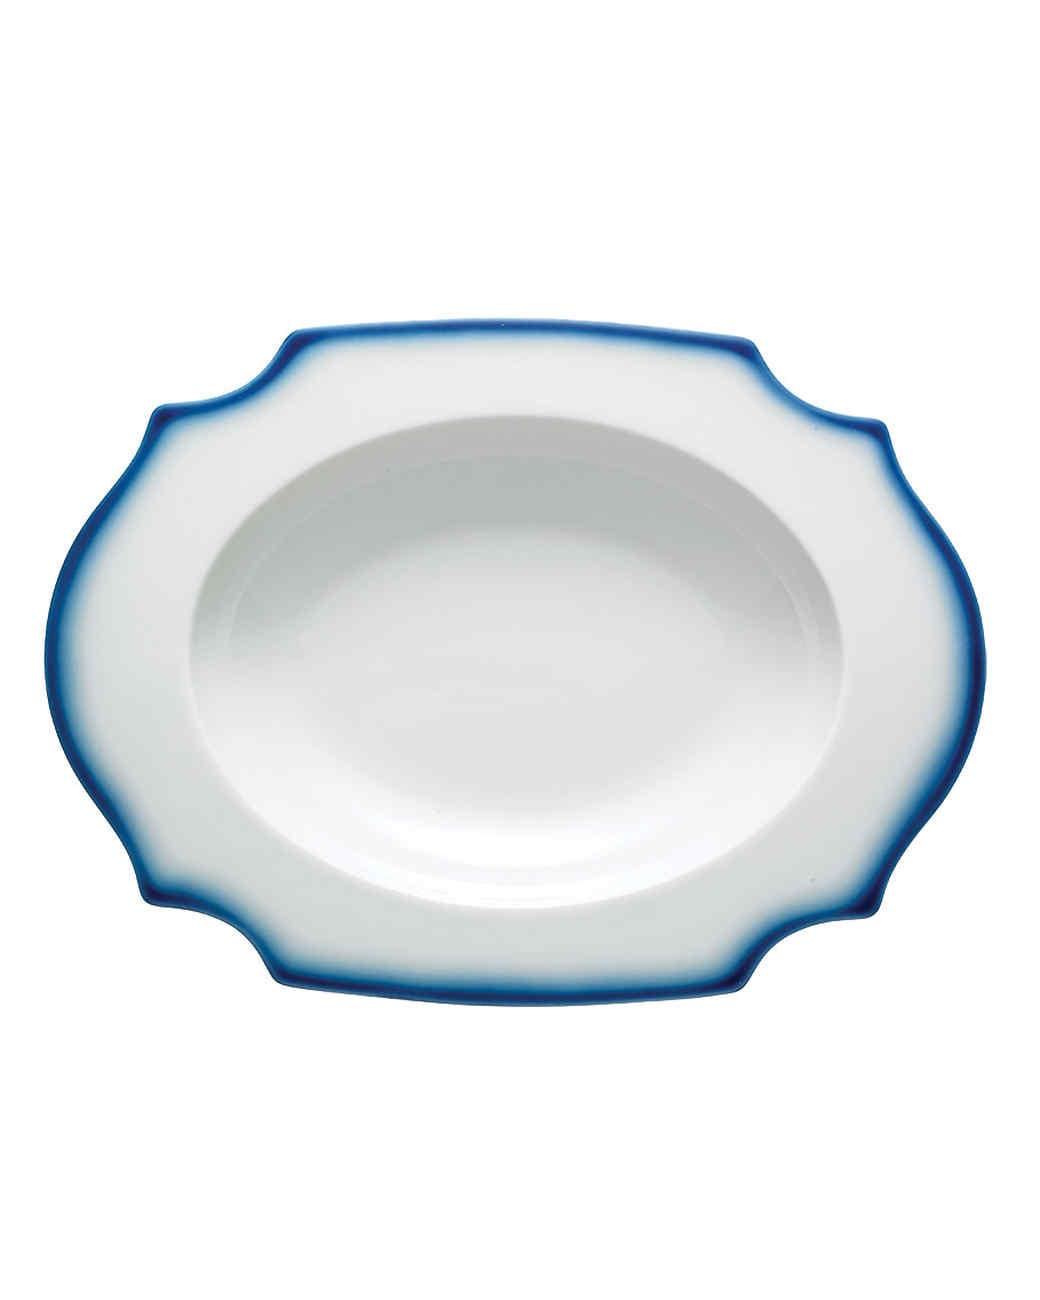 mld106502_1210_d_bowl500.jpg